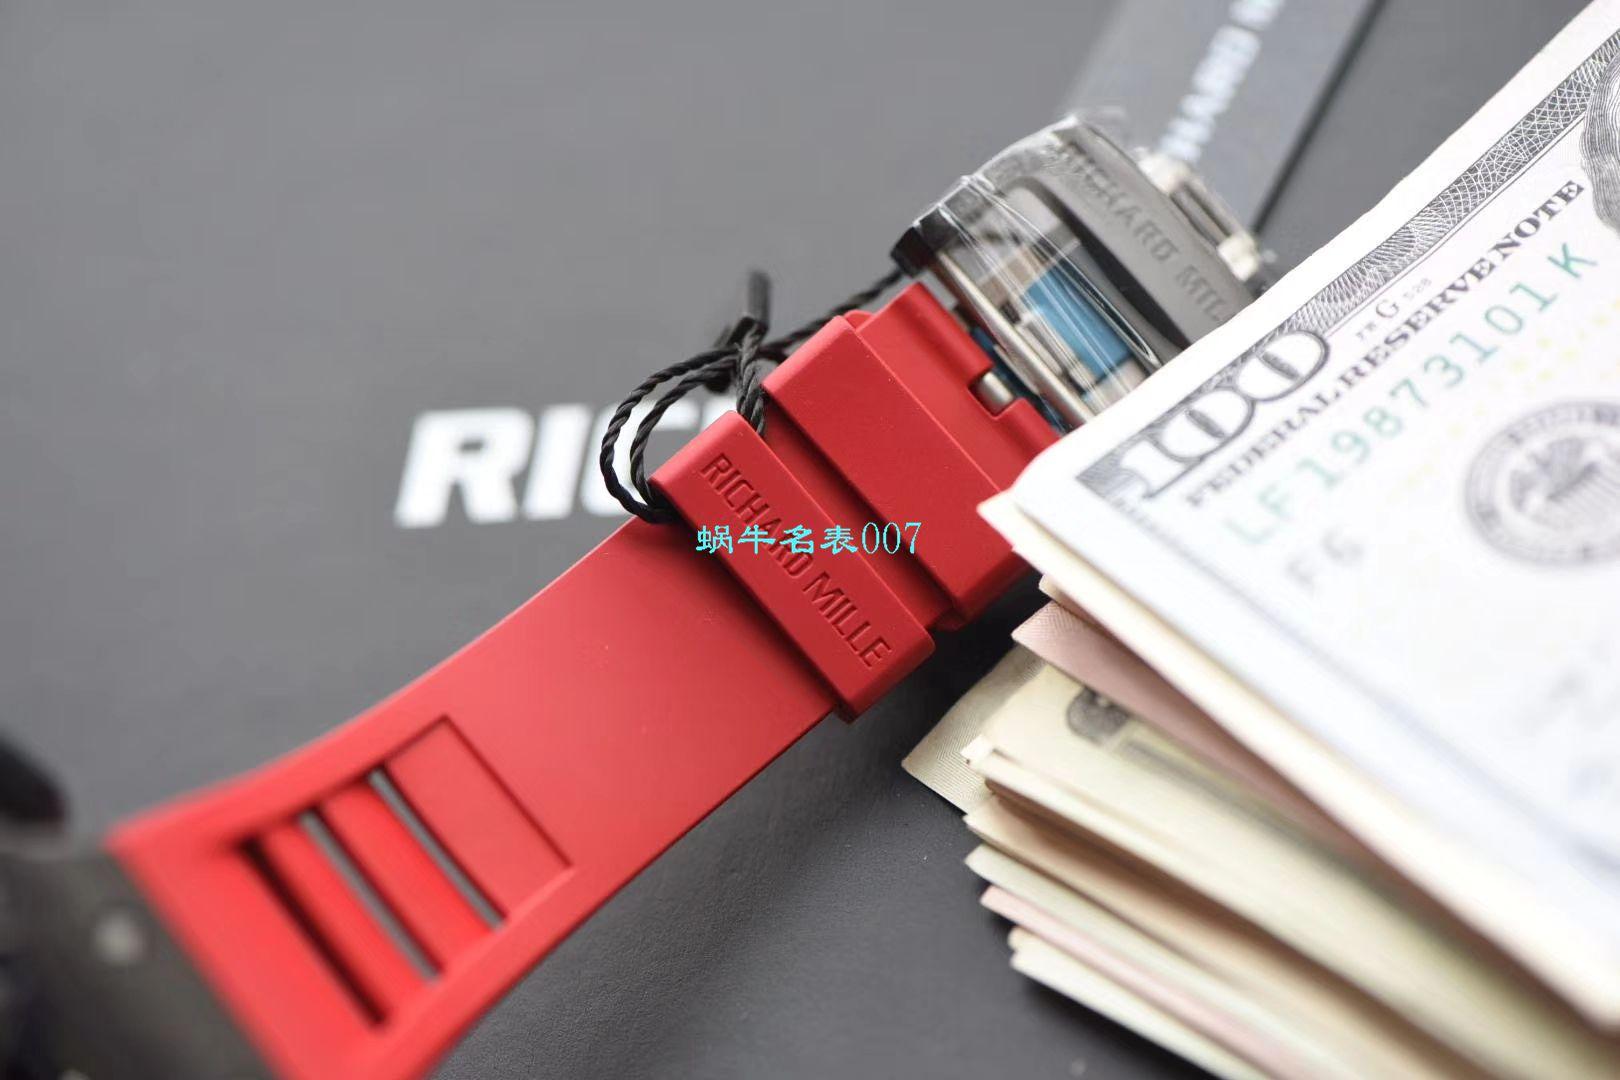 KV厂最强进口原纹碳纤维V3升级版RICHARD MILLE里查德米尔男士系列RM 35-01腕表 / KV03501V302